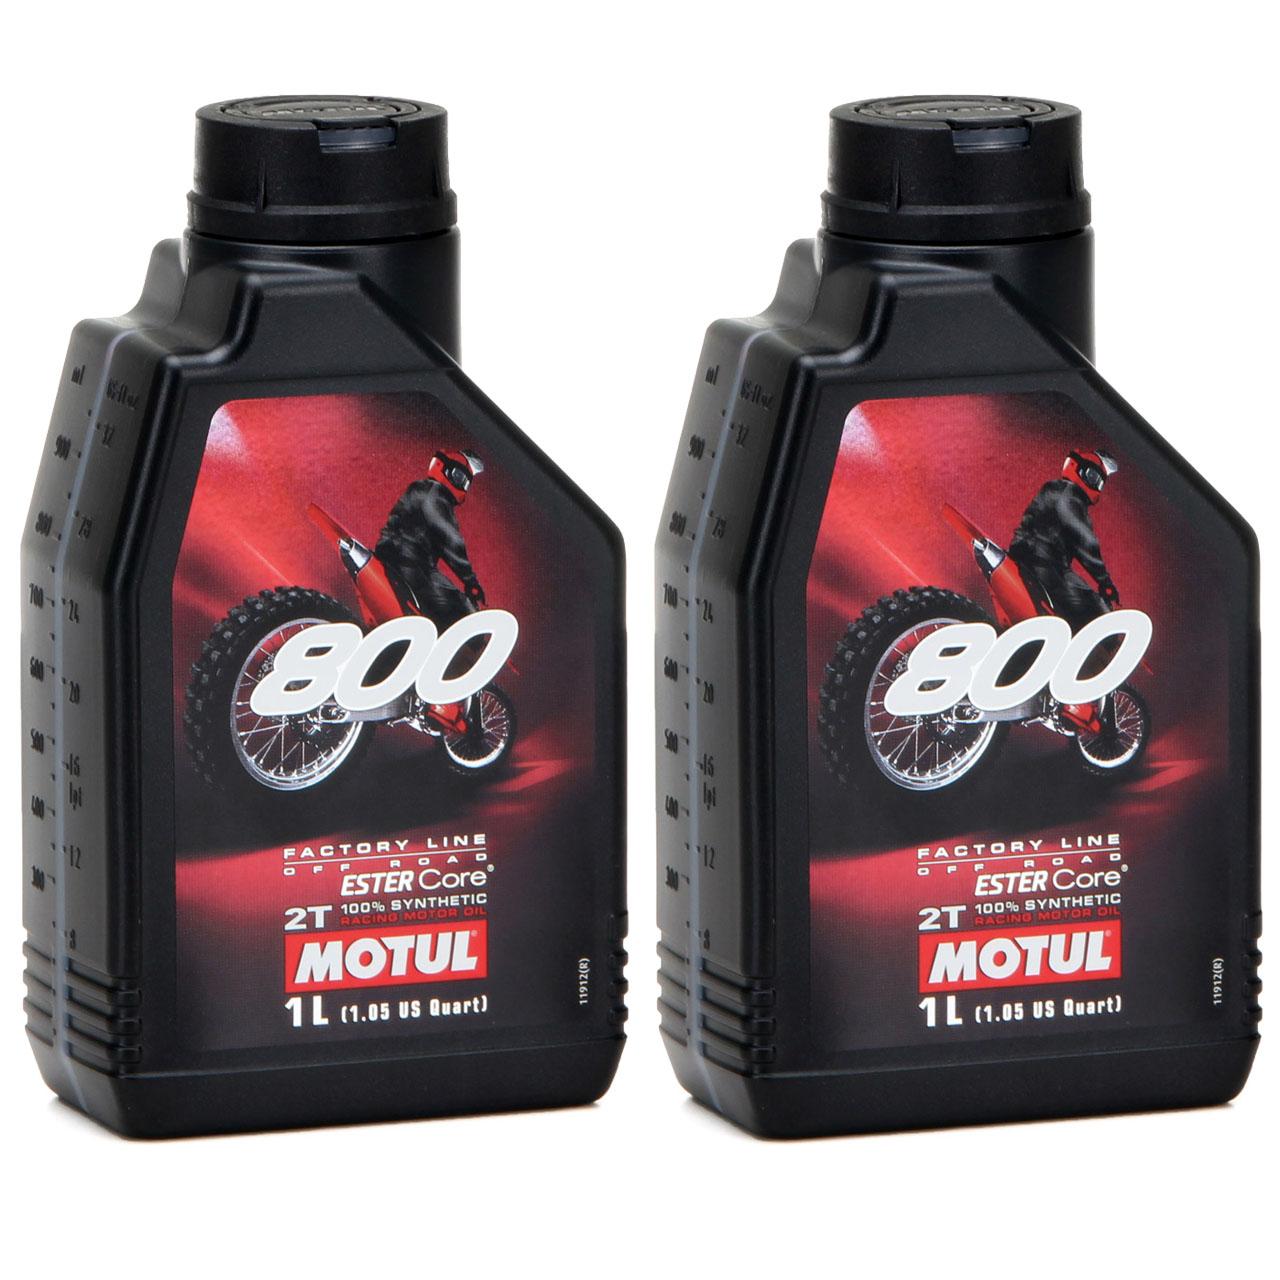 MOTUL 800 2T 2-TAKT Motoröl Öl OFF ROAD Factory Line ESTER Core - 2L 2 Liter